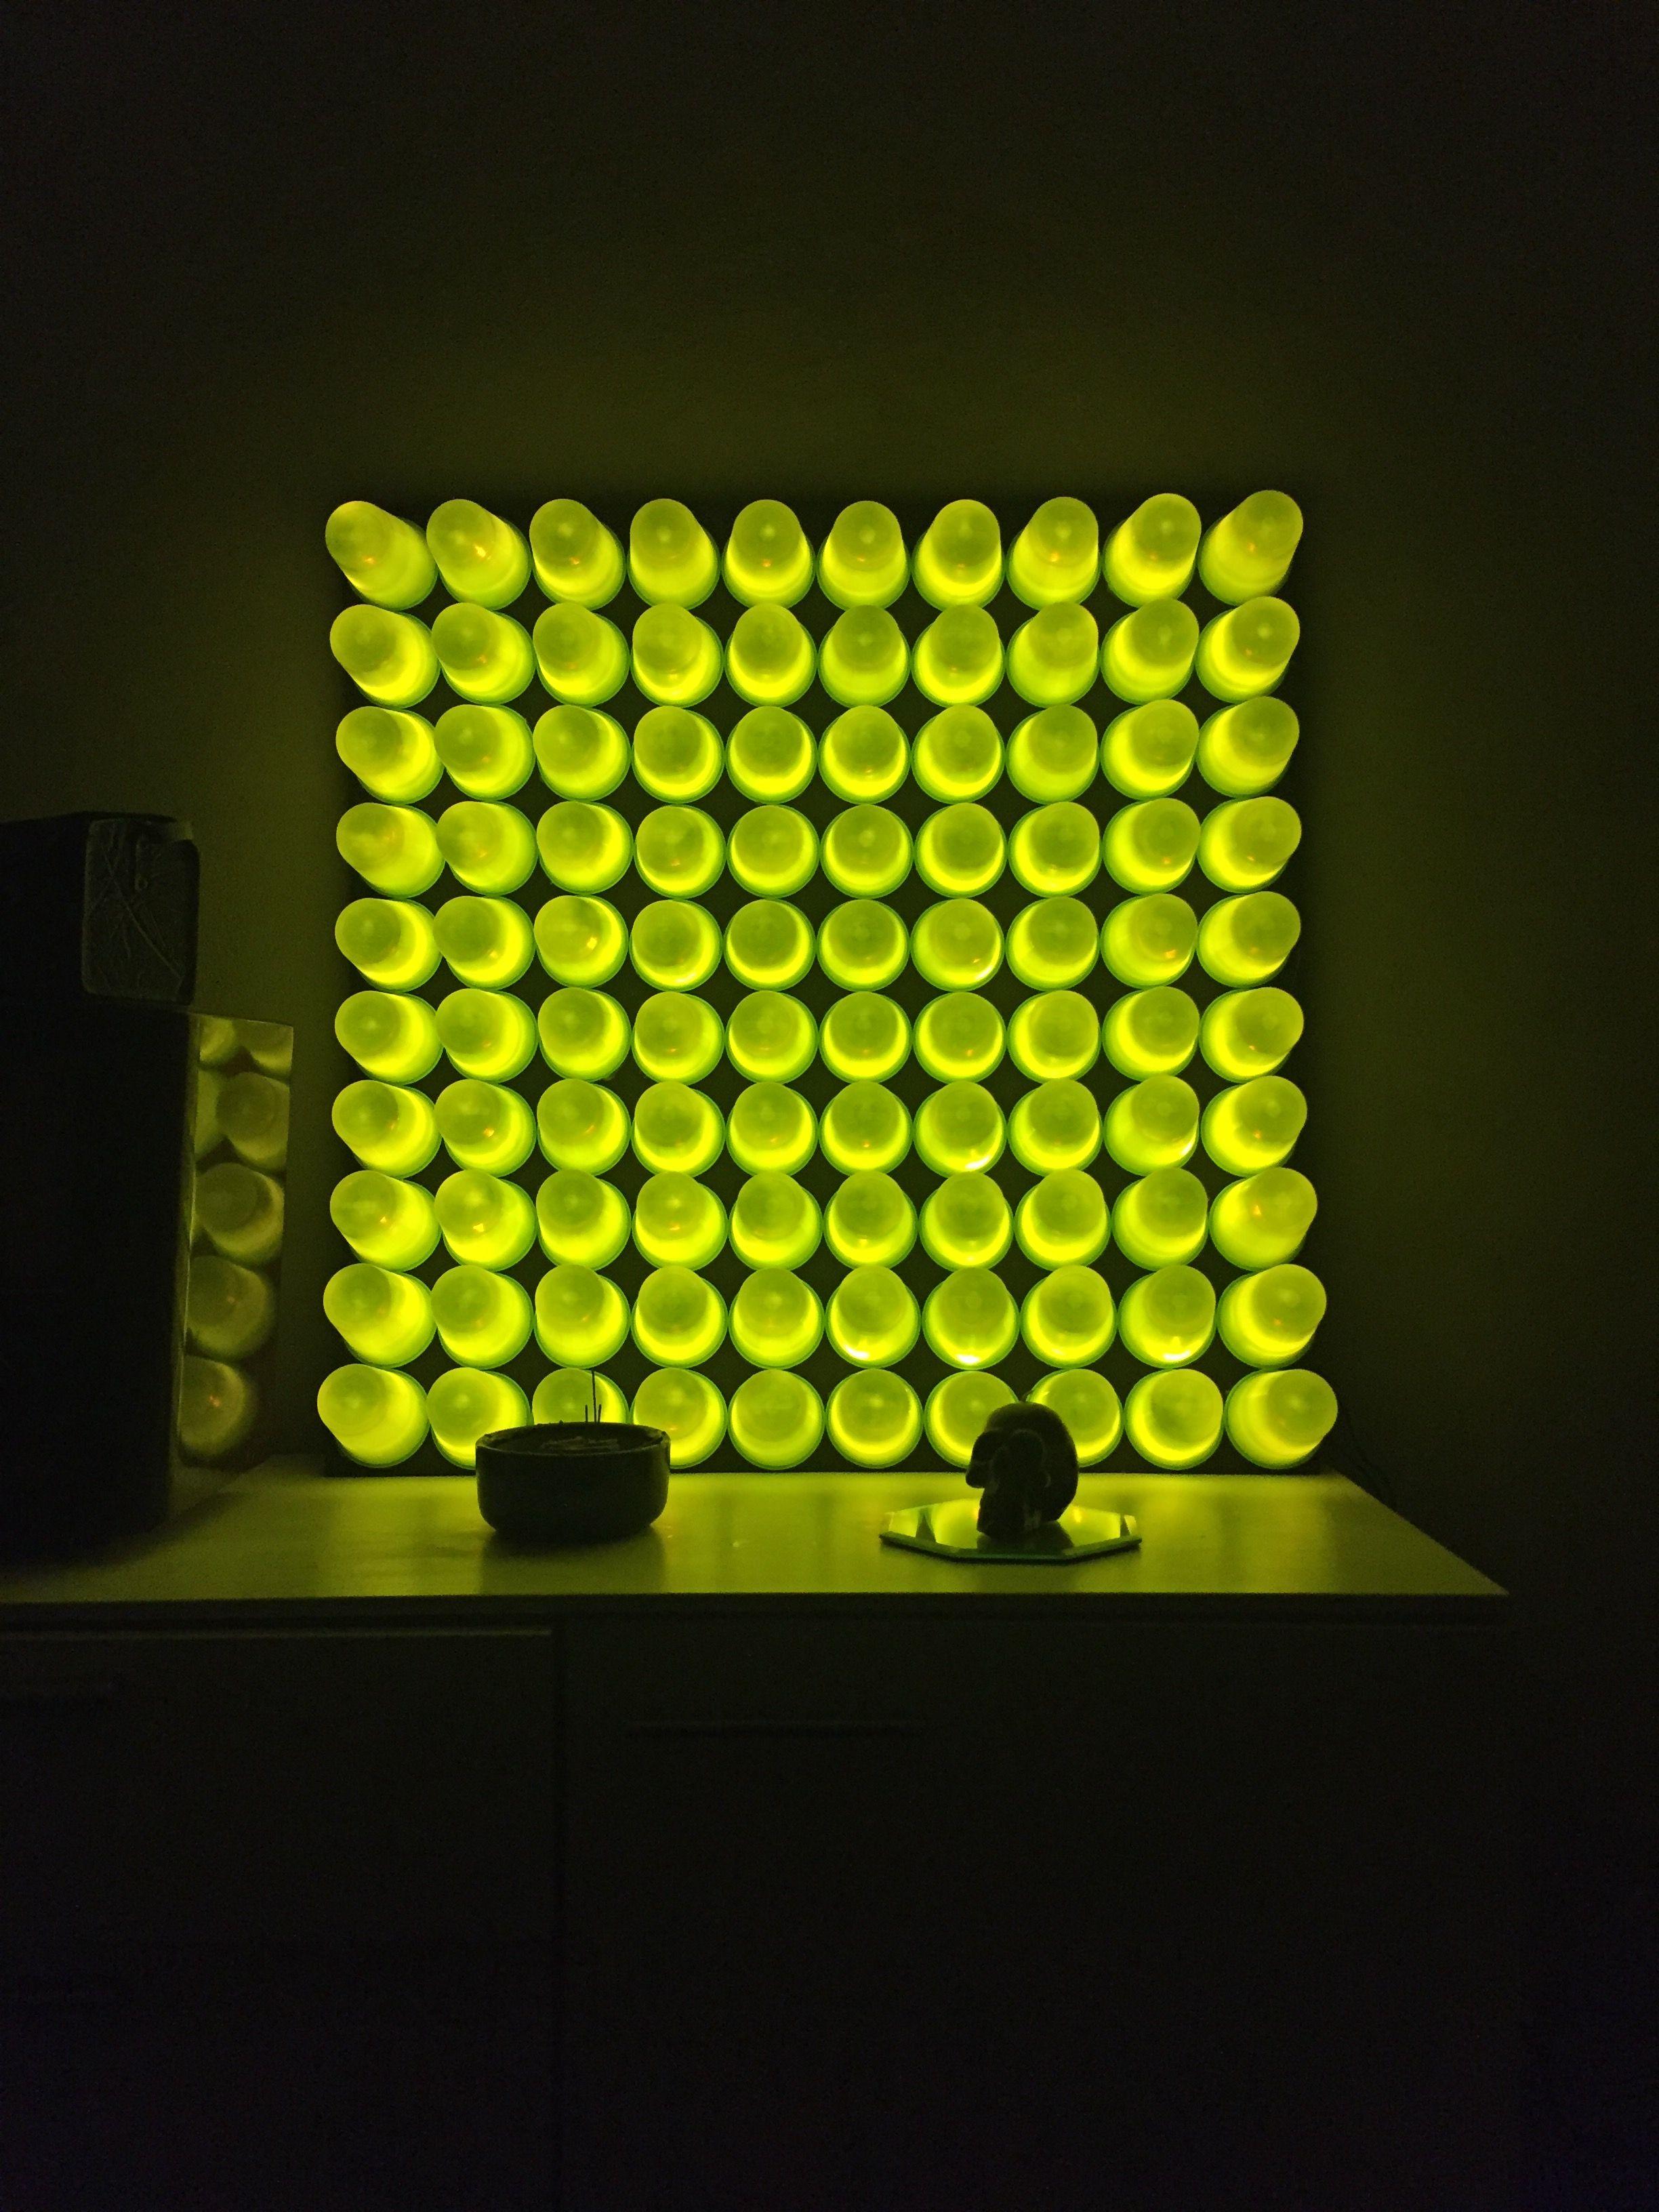 Plastikbecher Led Lampe Lampe Selber Bauen Led Lampe Lampen